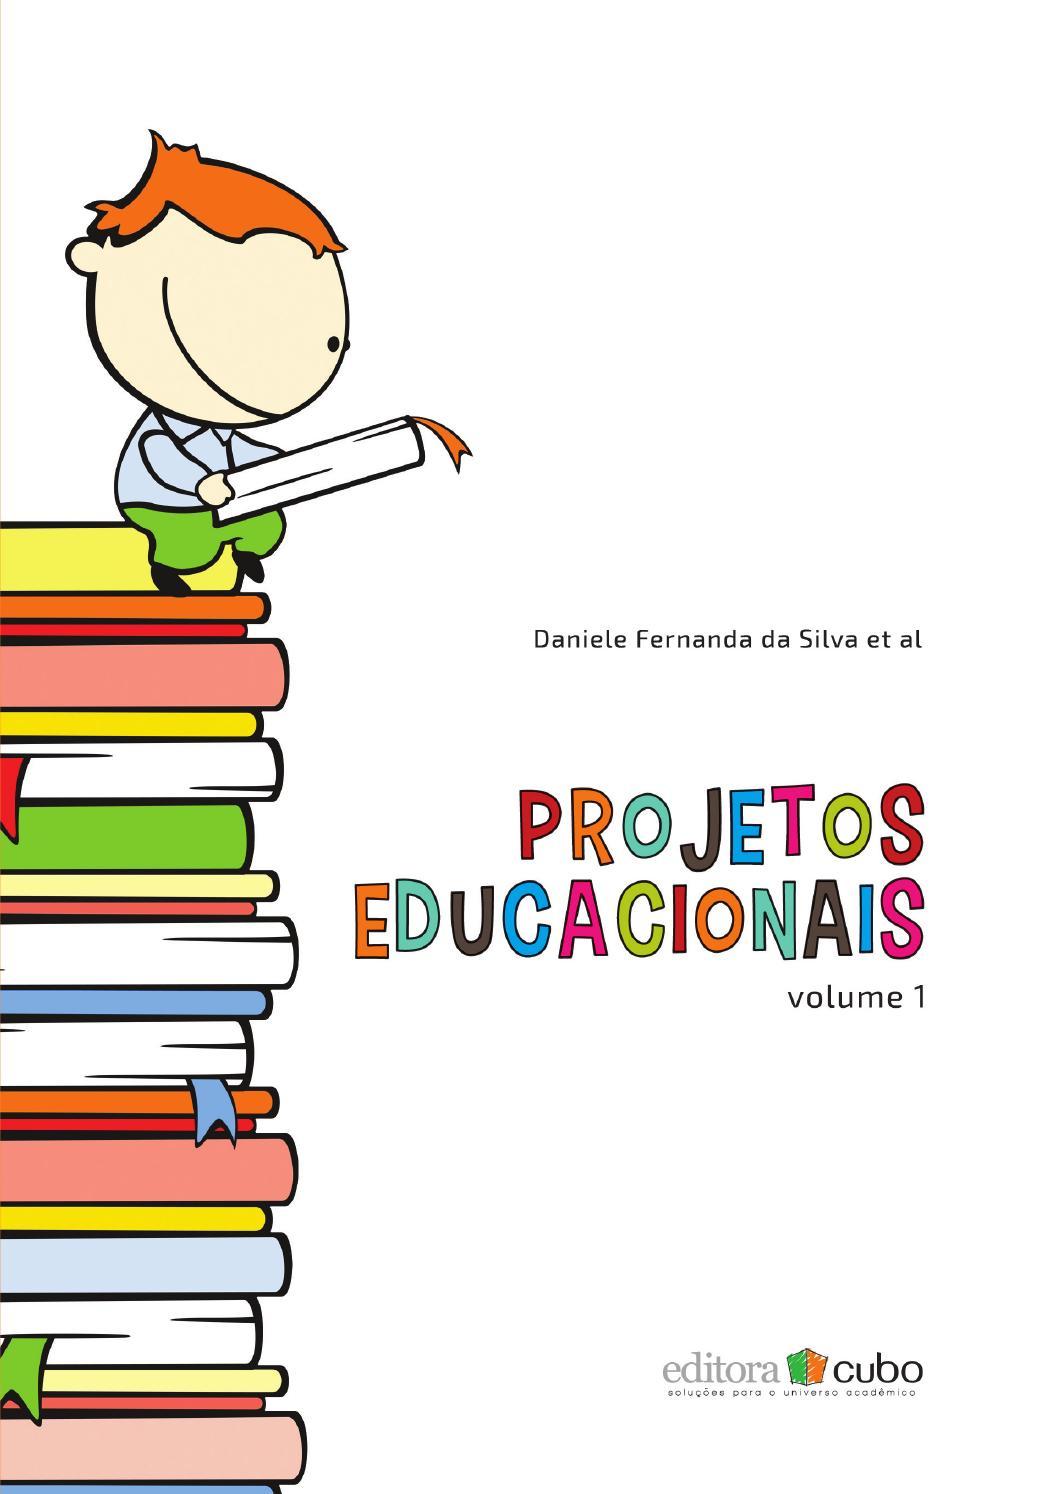 7c173e539c Projetos Educacionais - Volume 1 by Editora Cubo - issuu